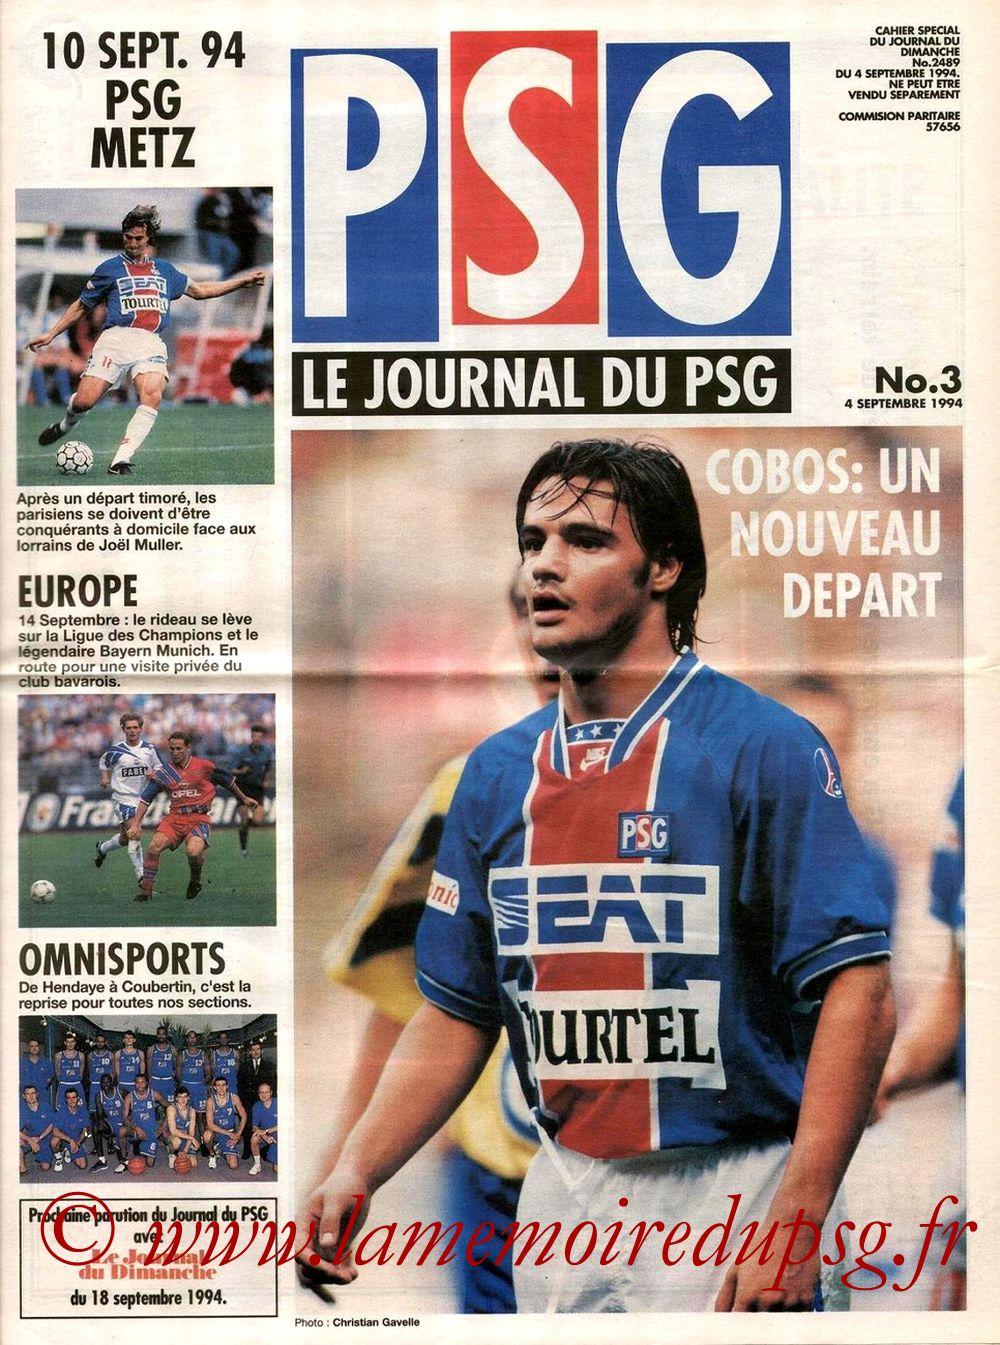 1994-09-14  PSG-Bayern Munich (1ère Poule C1, Le journal du PSG N°3)